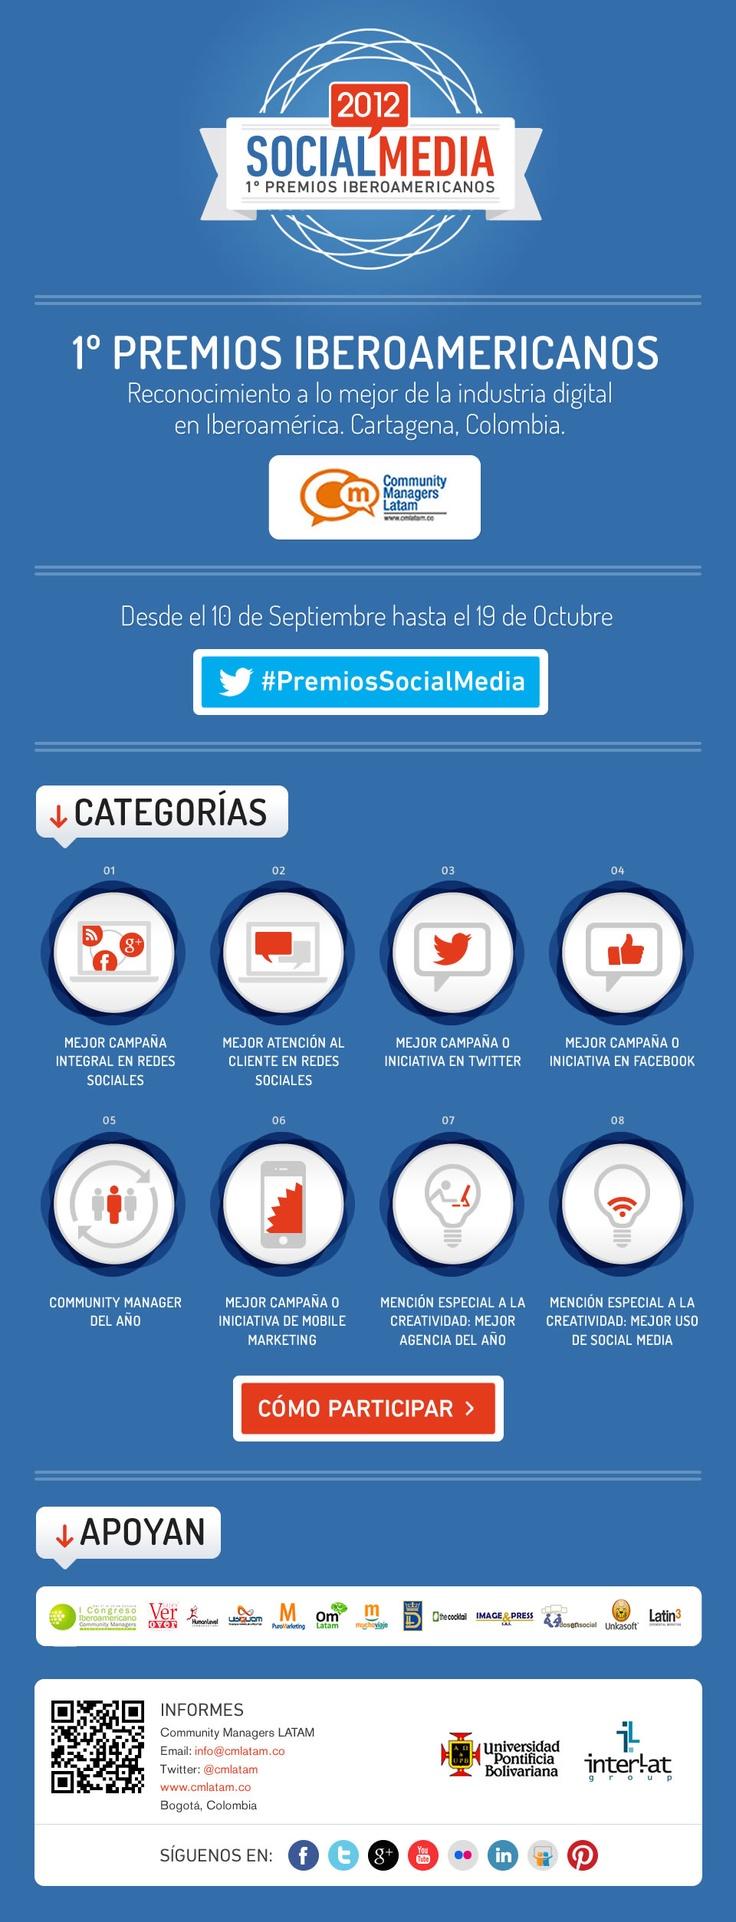 Postula tu campaña #PremiosSocialMedia Iberoamericanos aquí ning.it/O06MNG #CommunityManagement twitpic.com/ati56b